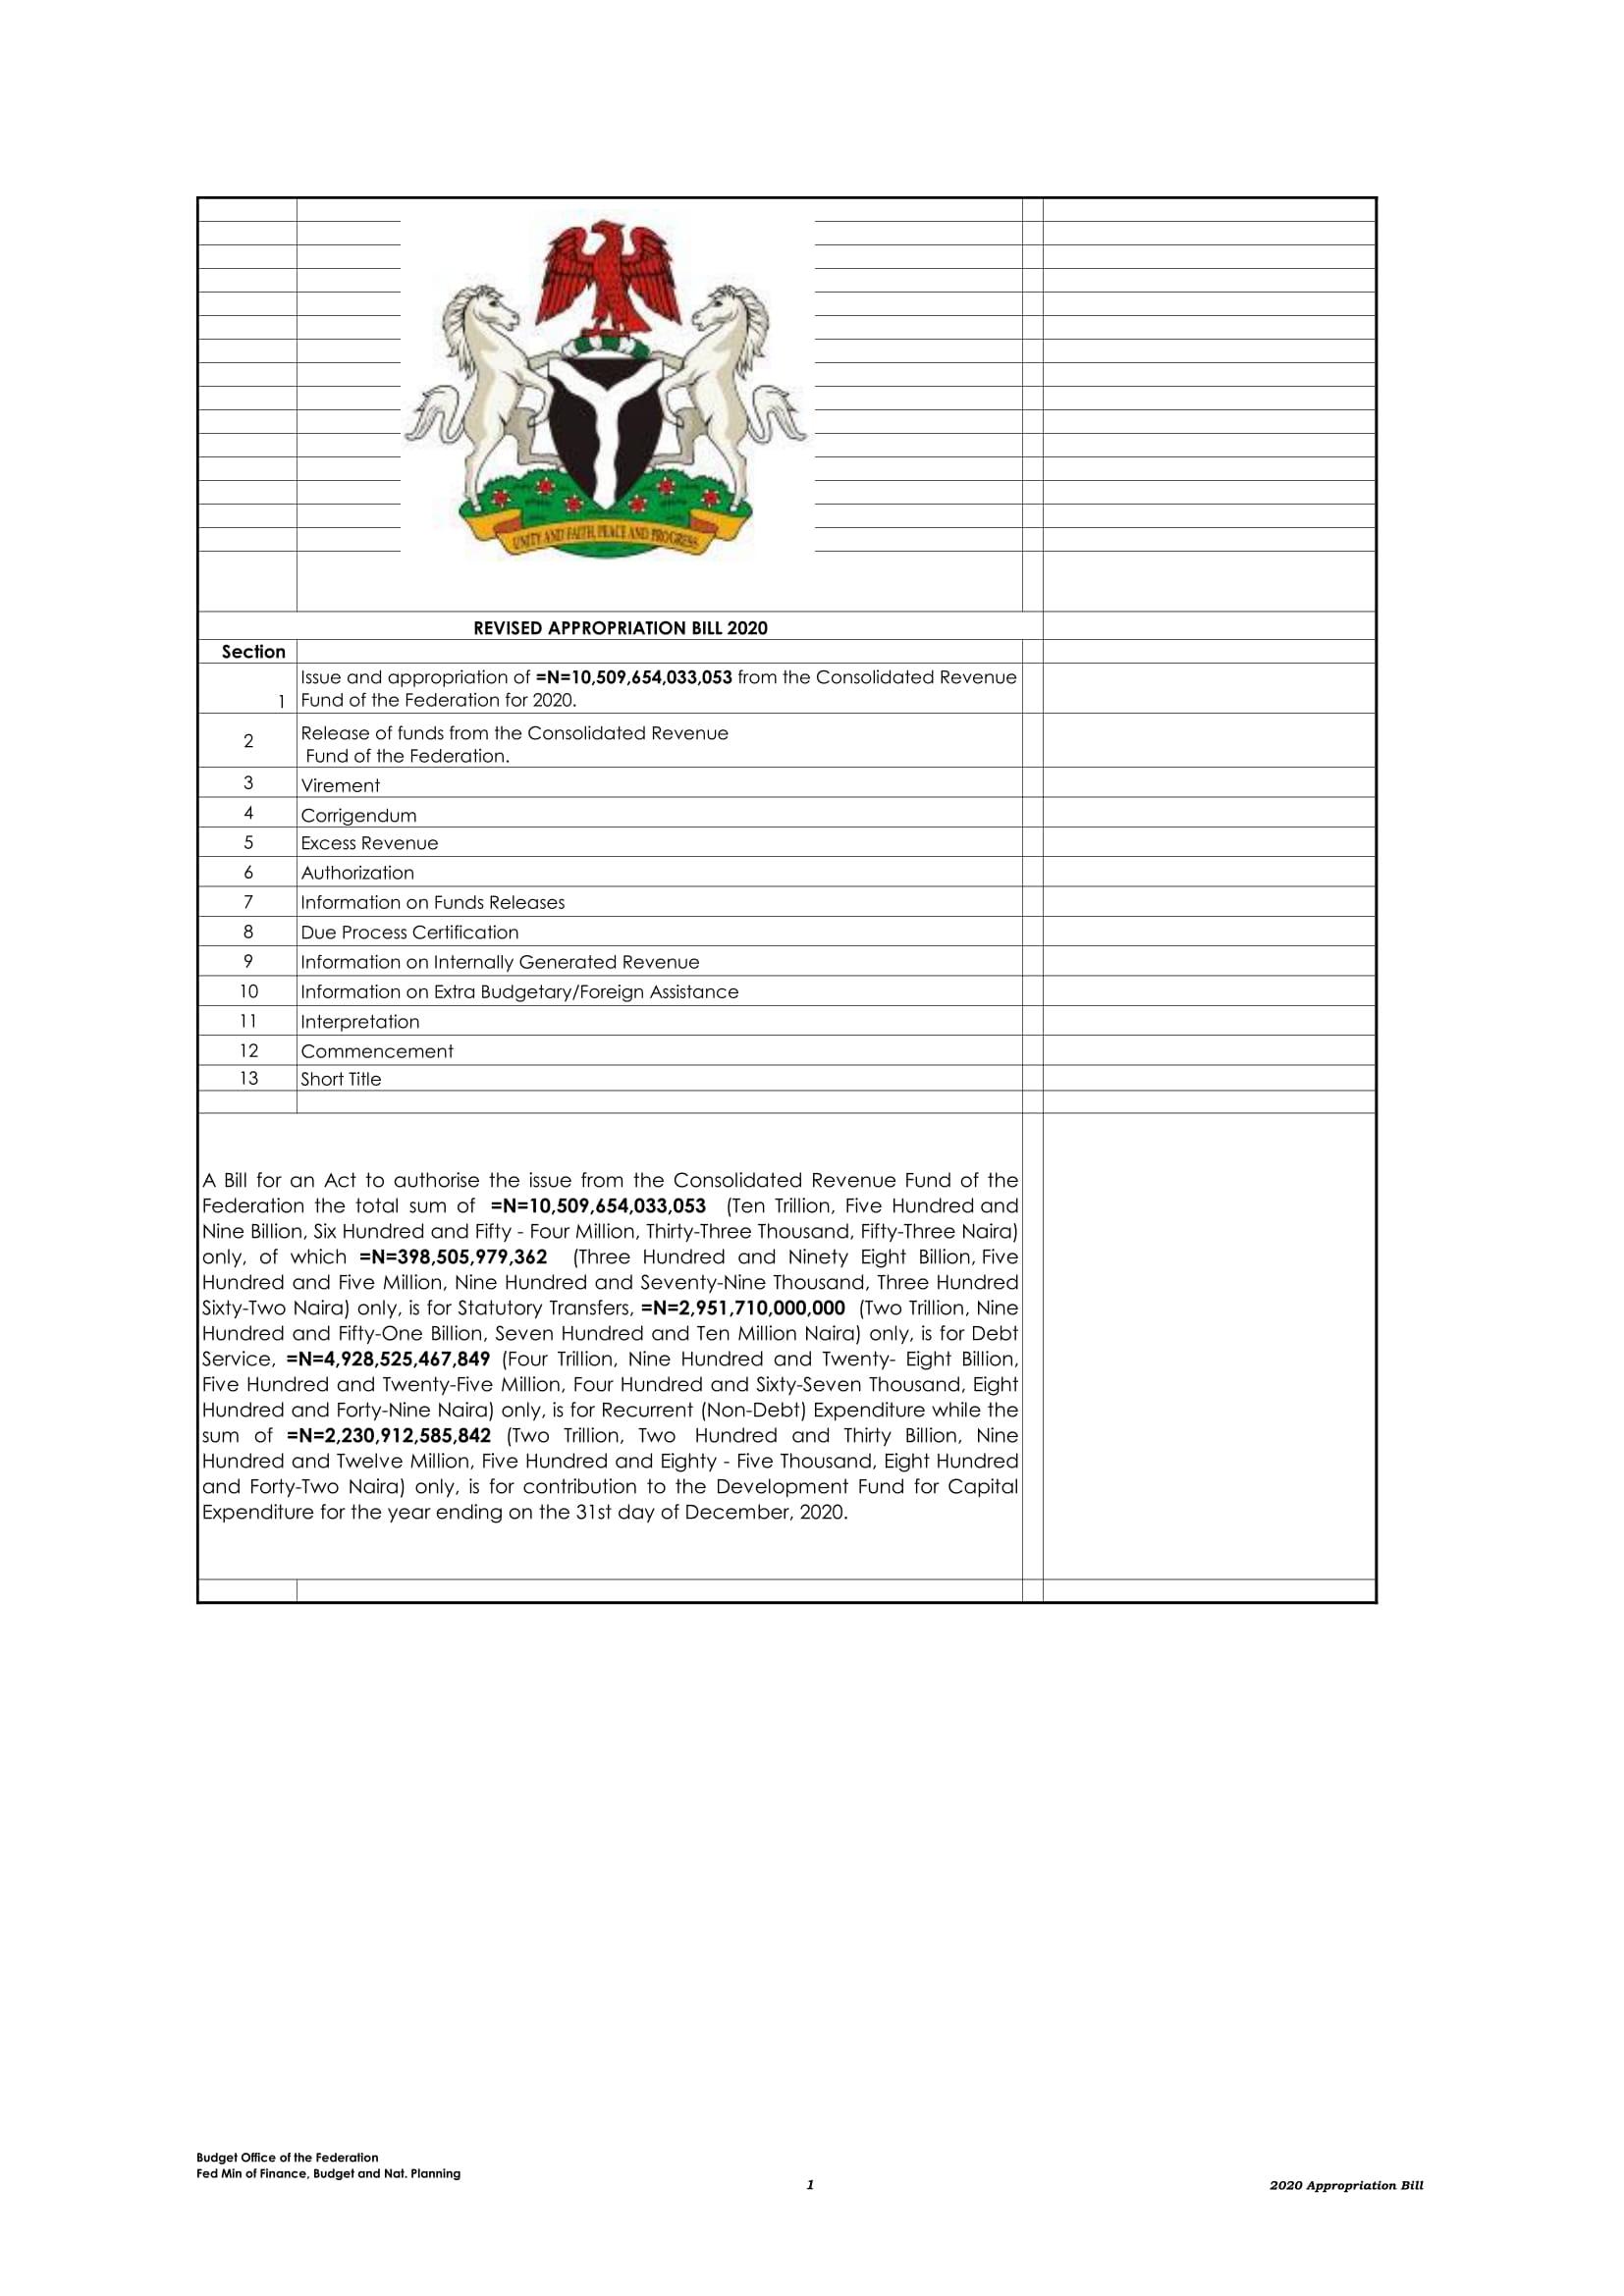 Buhari signs N10.8 Trillion revised 2020 Budget